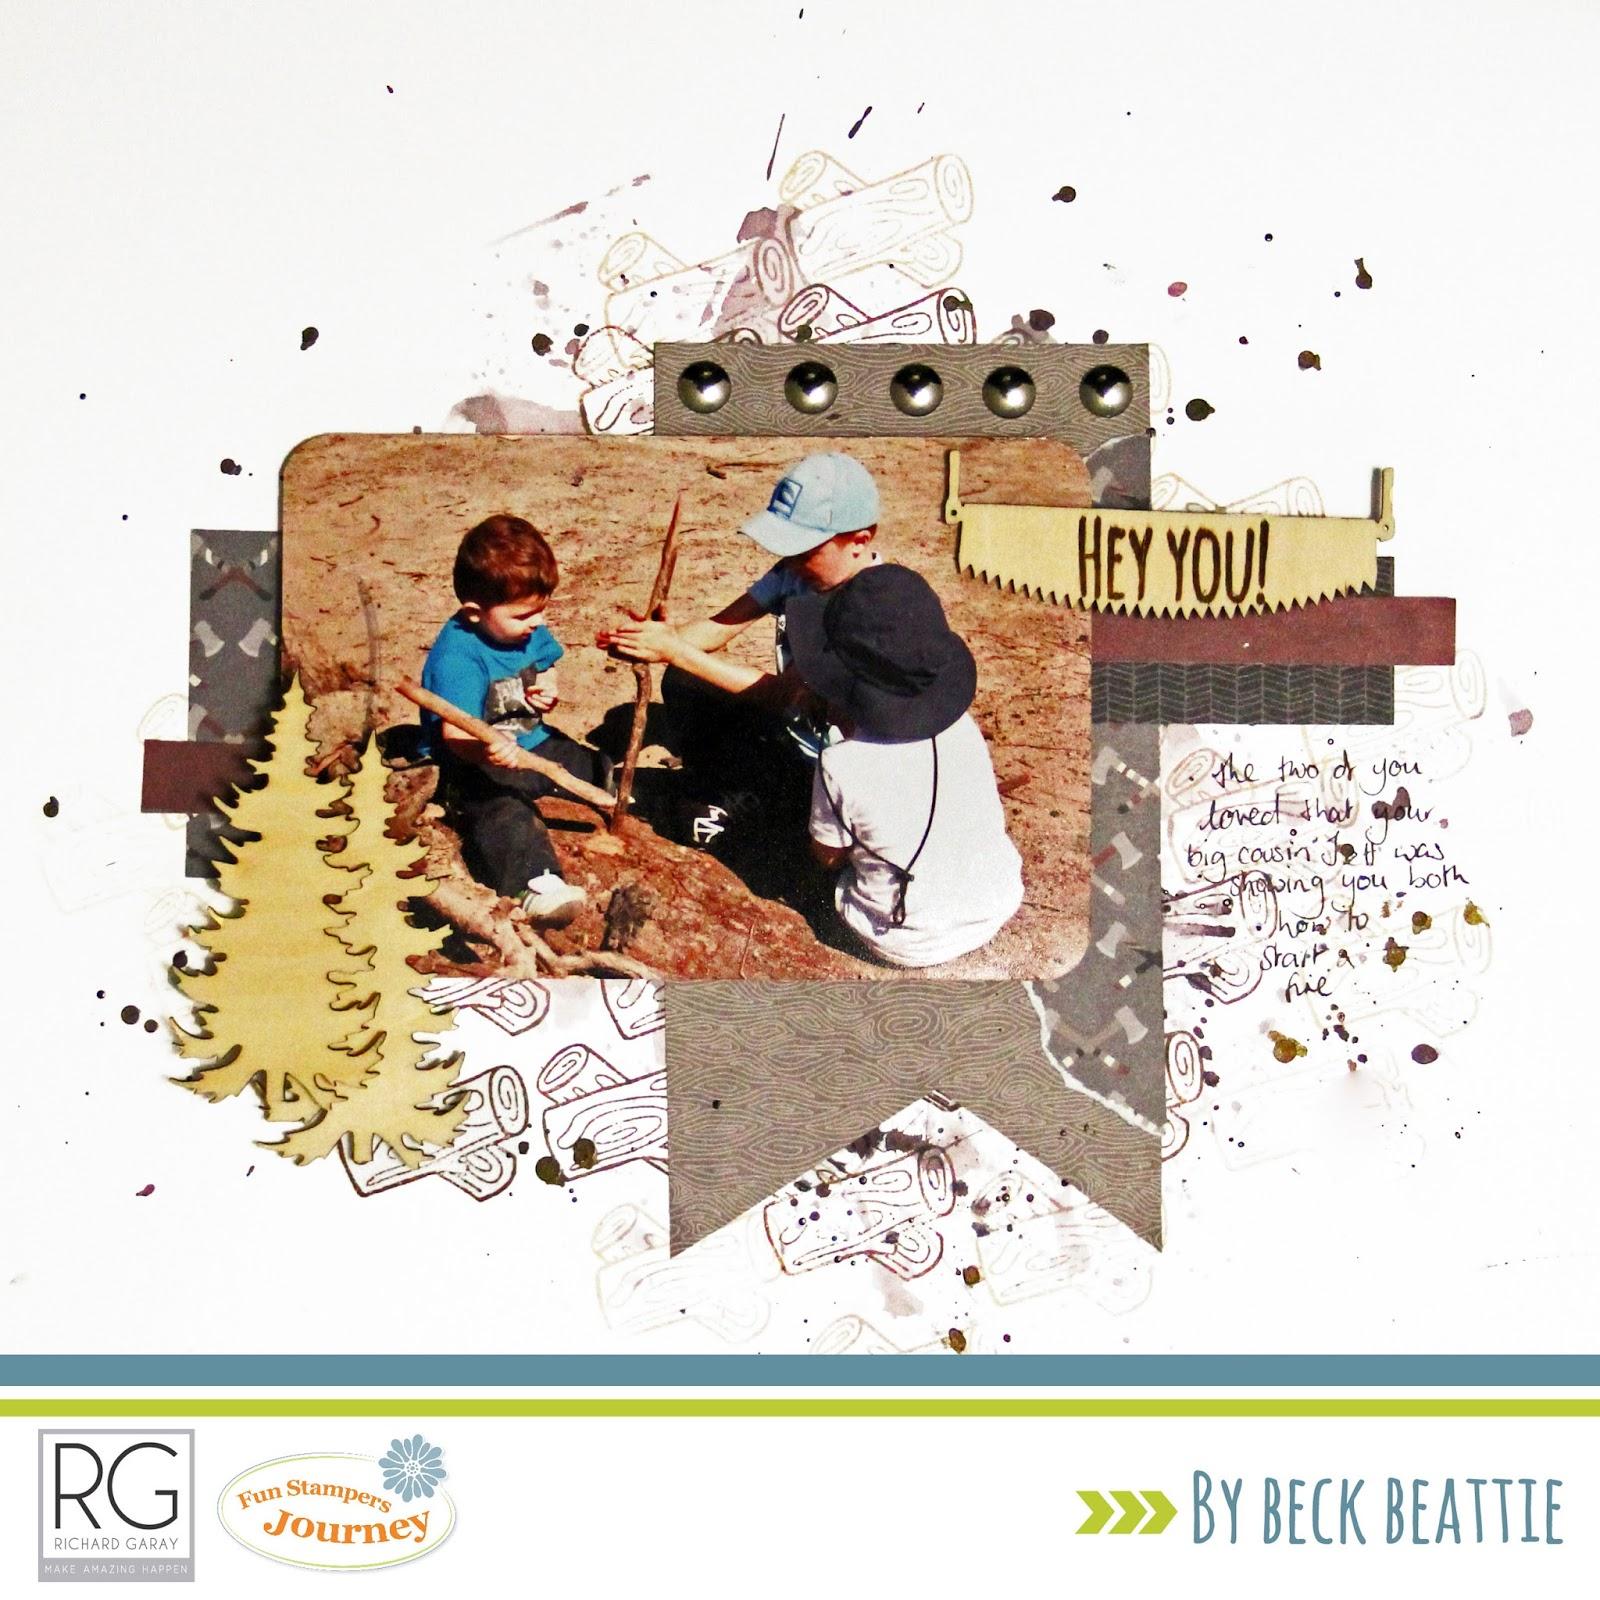 Beck BT: Creative Fun with RG Lumberjack Days collection